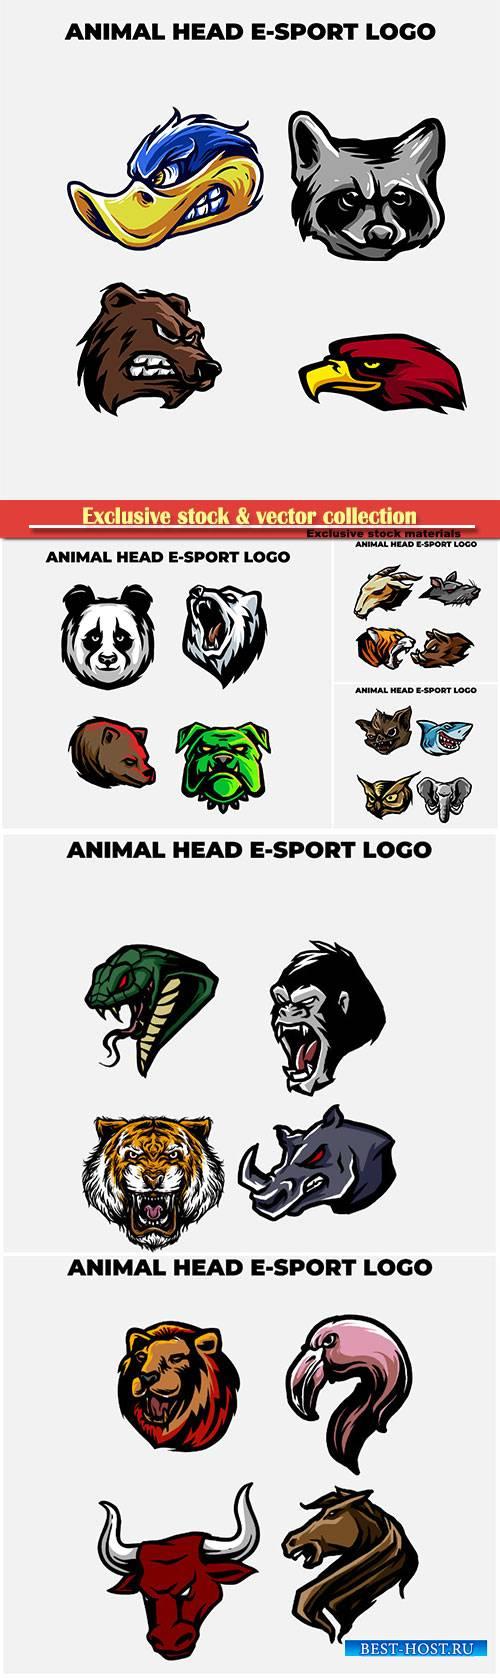 Animal head mascot logo vector